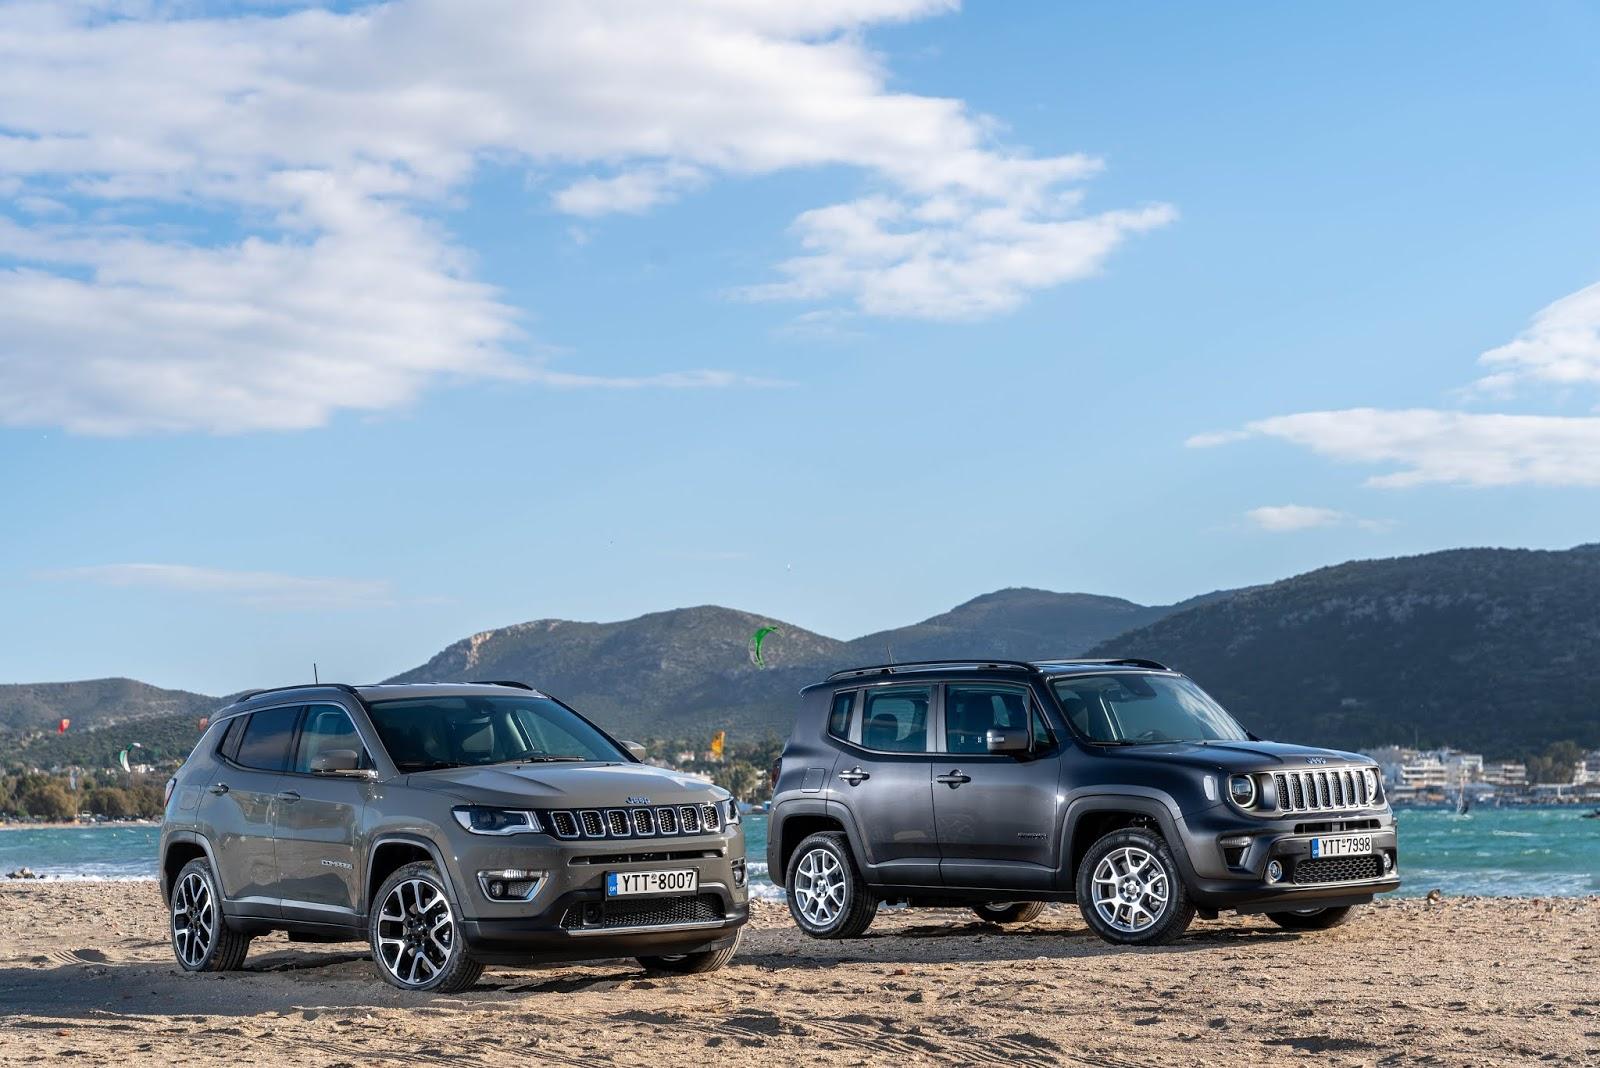 "common 5ff71404de0b0 ""Chatting with Jeep"": Η Jeep σε ένα σύντομο video δίνει απαντήσεις για τα νέα Plug-in Hybrid, Renegade & Compass 4xe (& video) 4XE, Hybrid, Jeep, Jeep 4XE, Jeep Compass, Jeep Renegade, plug-in hybrid, Renegade, ειδήσεις, υβριδικό"